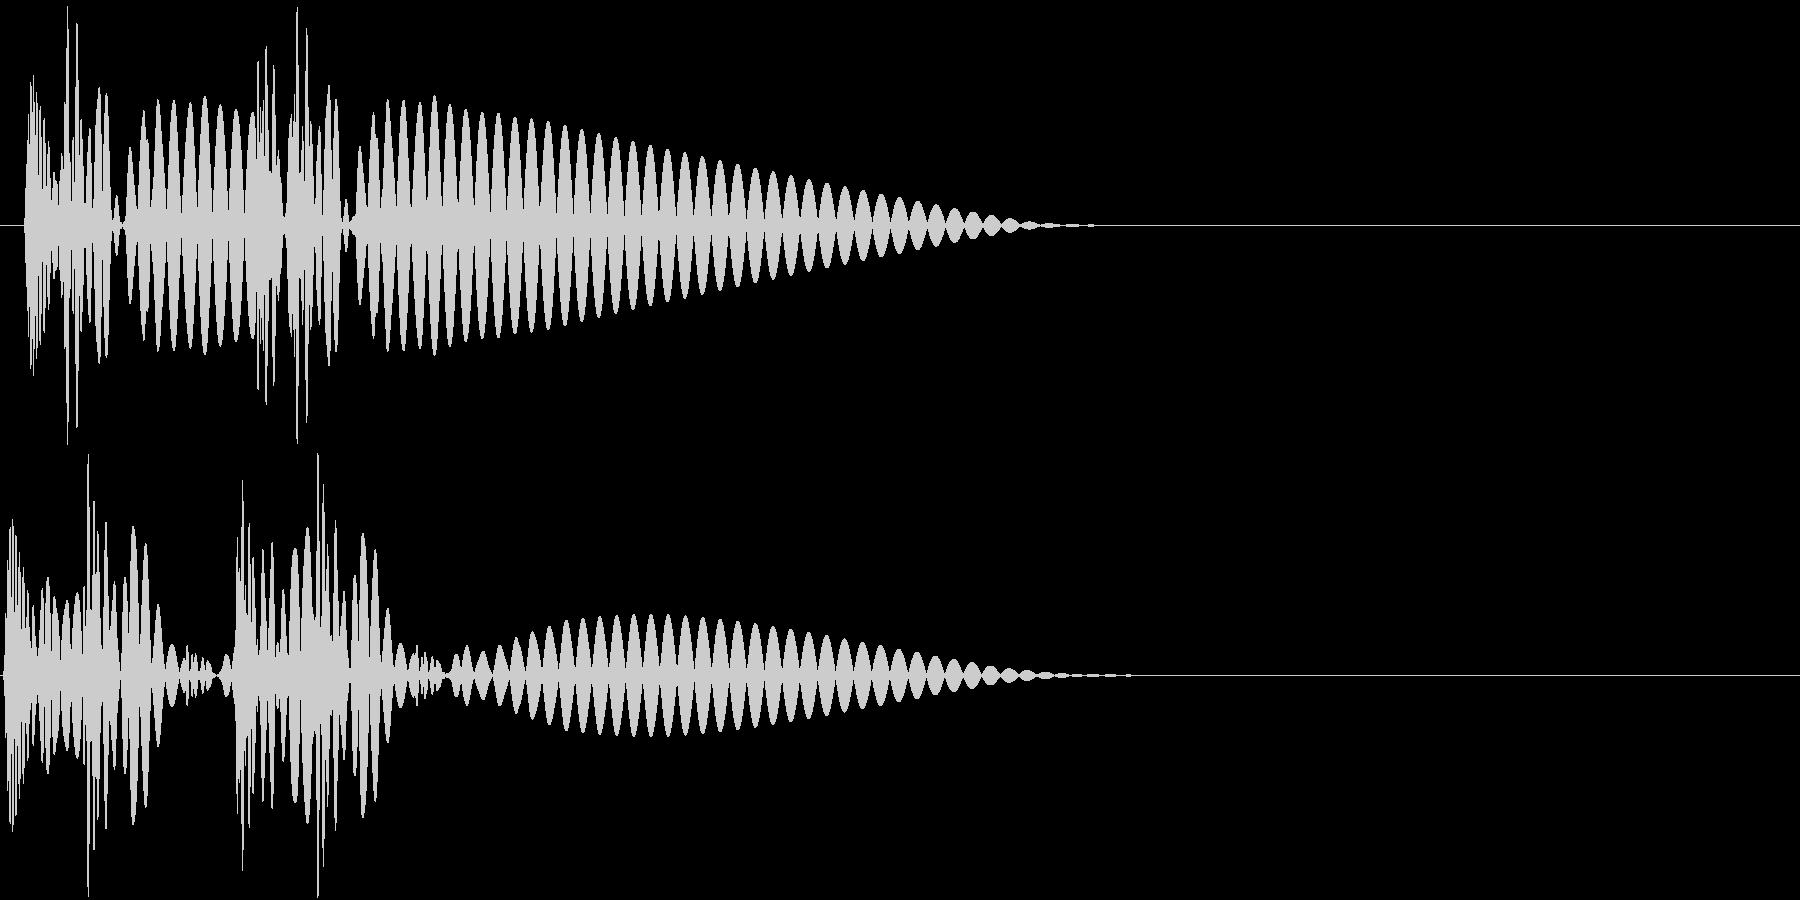 HeartBeat 心臓の音 2 単発の未再生の波形